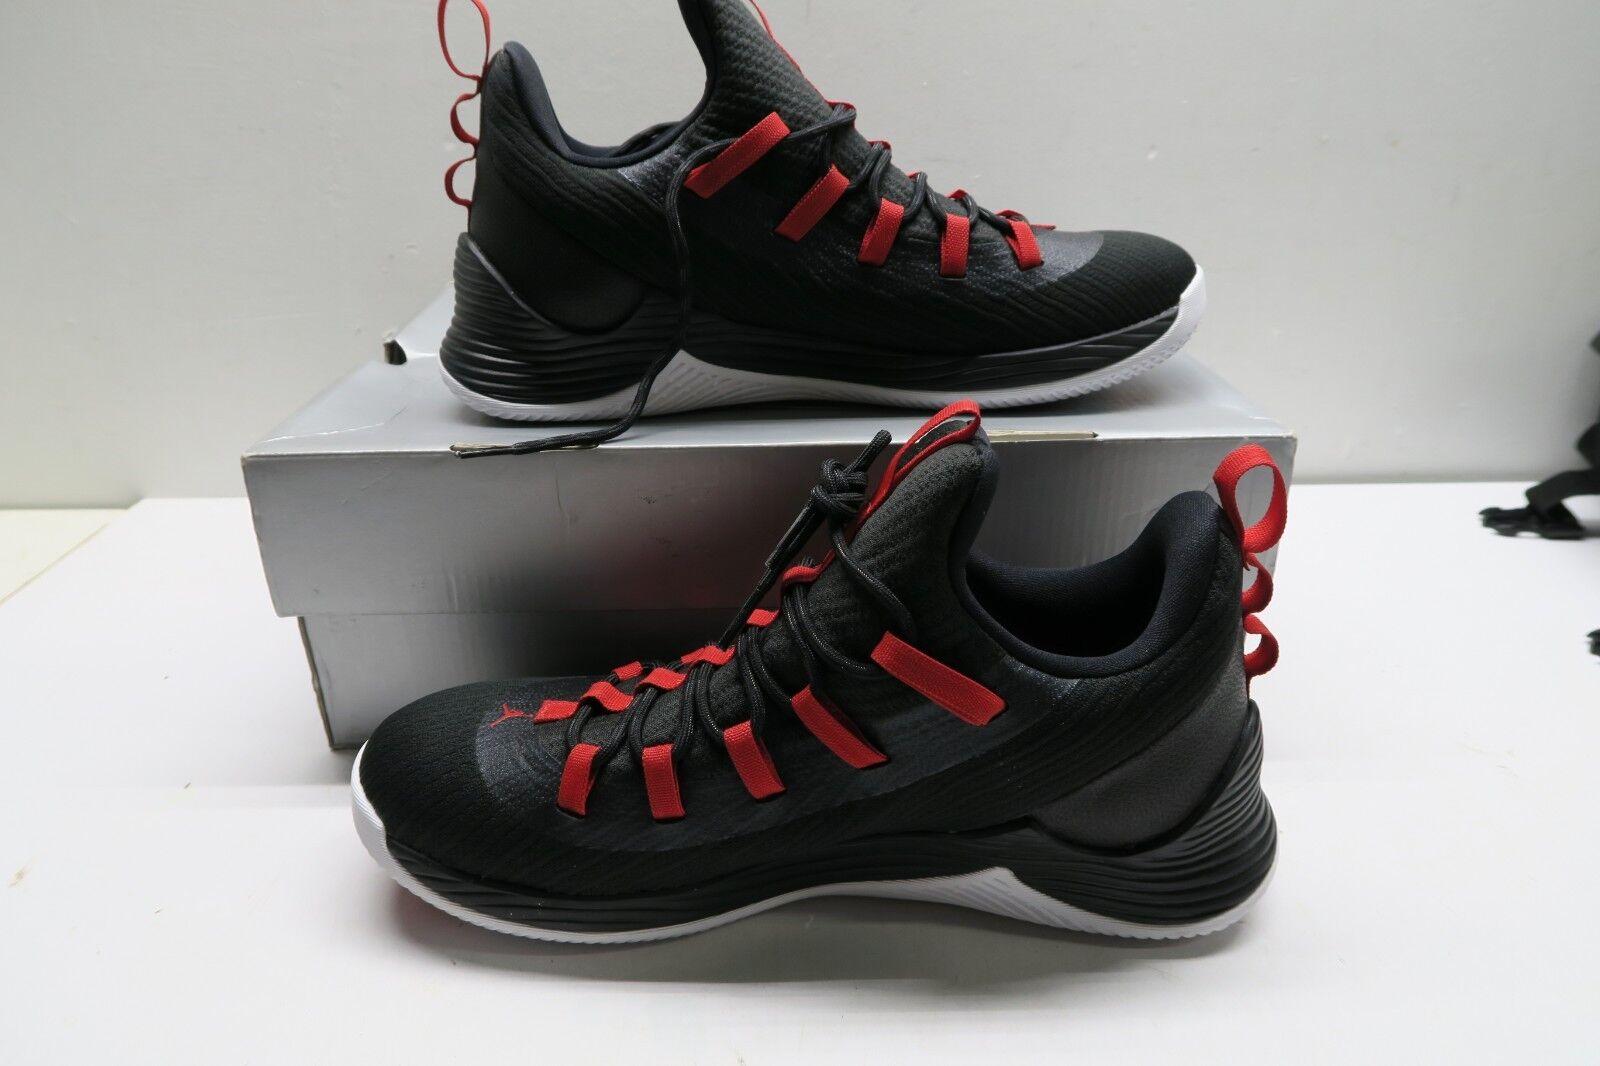 NIKE Jordan Ultra Fly 2 Low Mens Size 9 - Black & Red